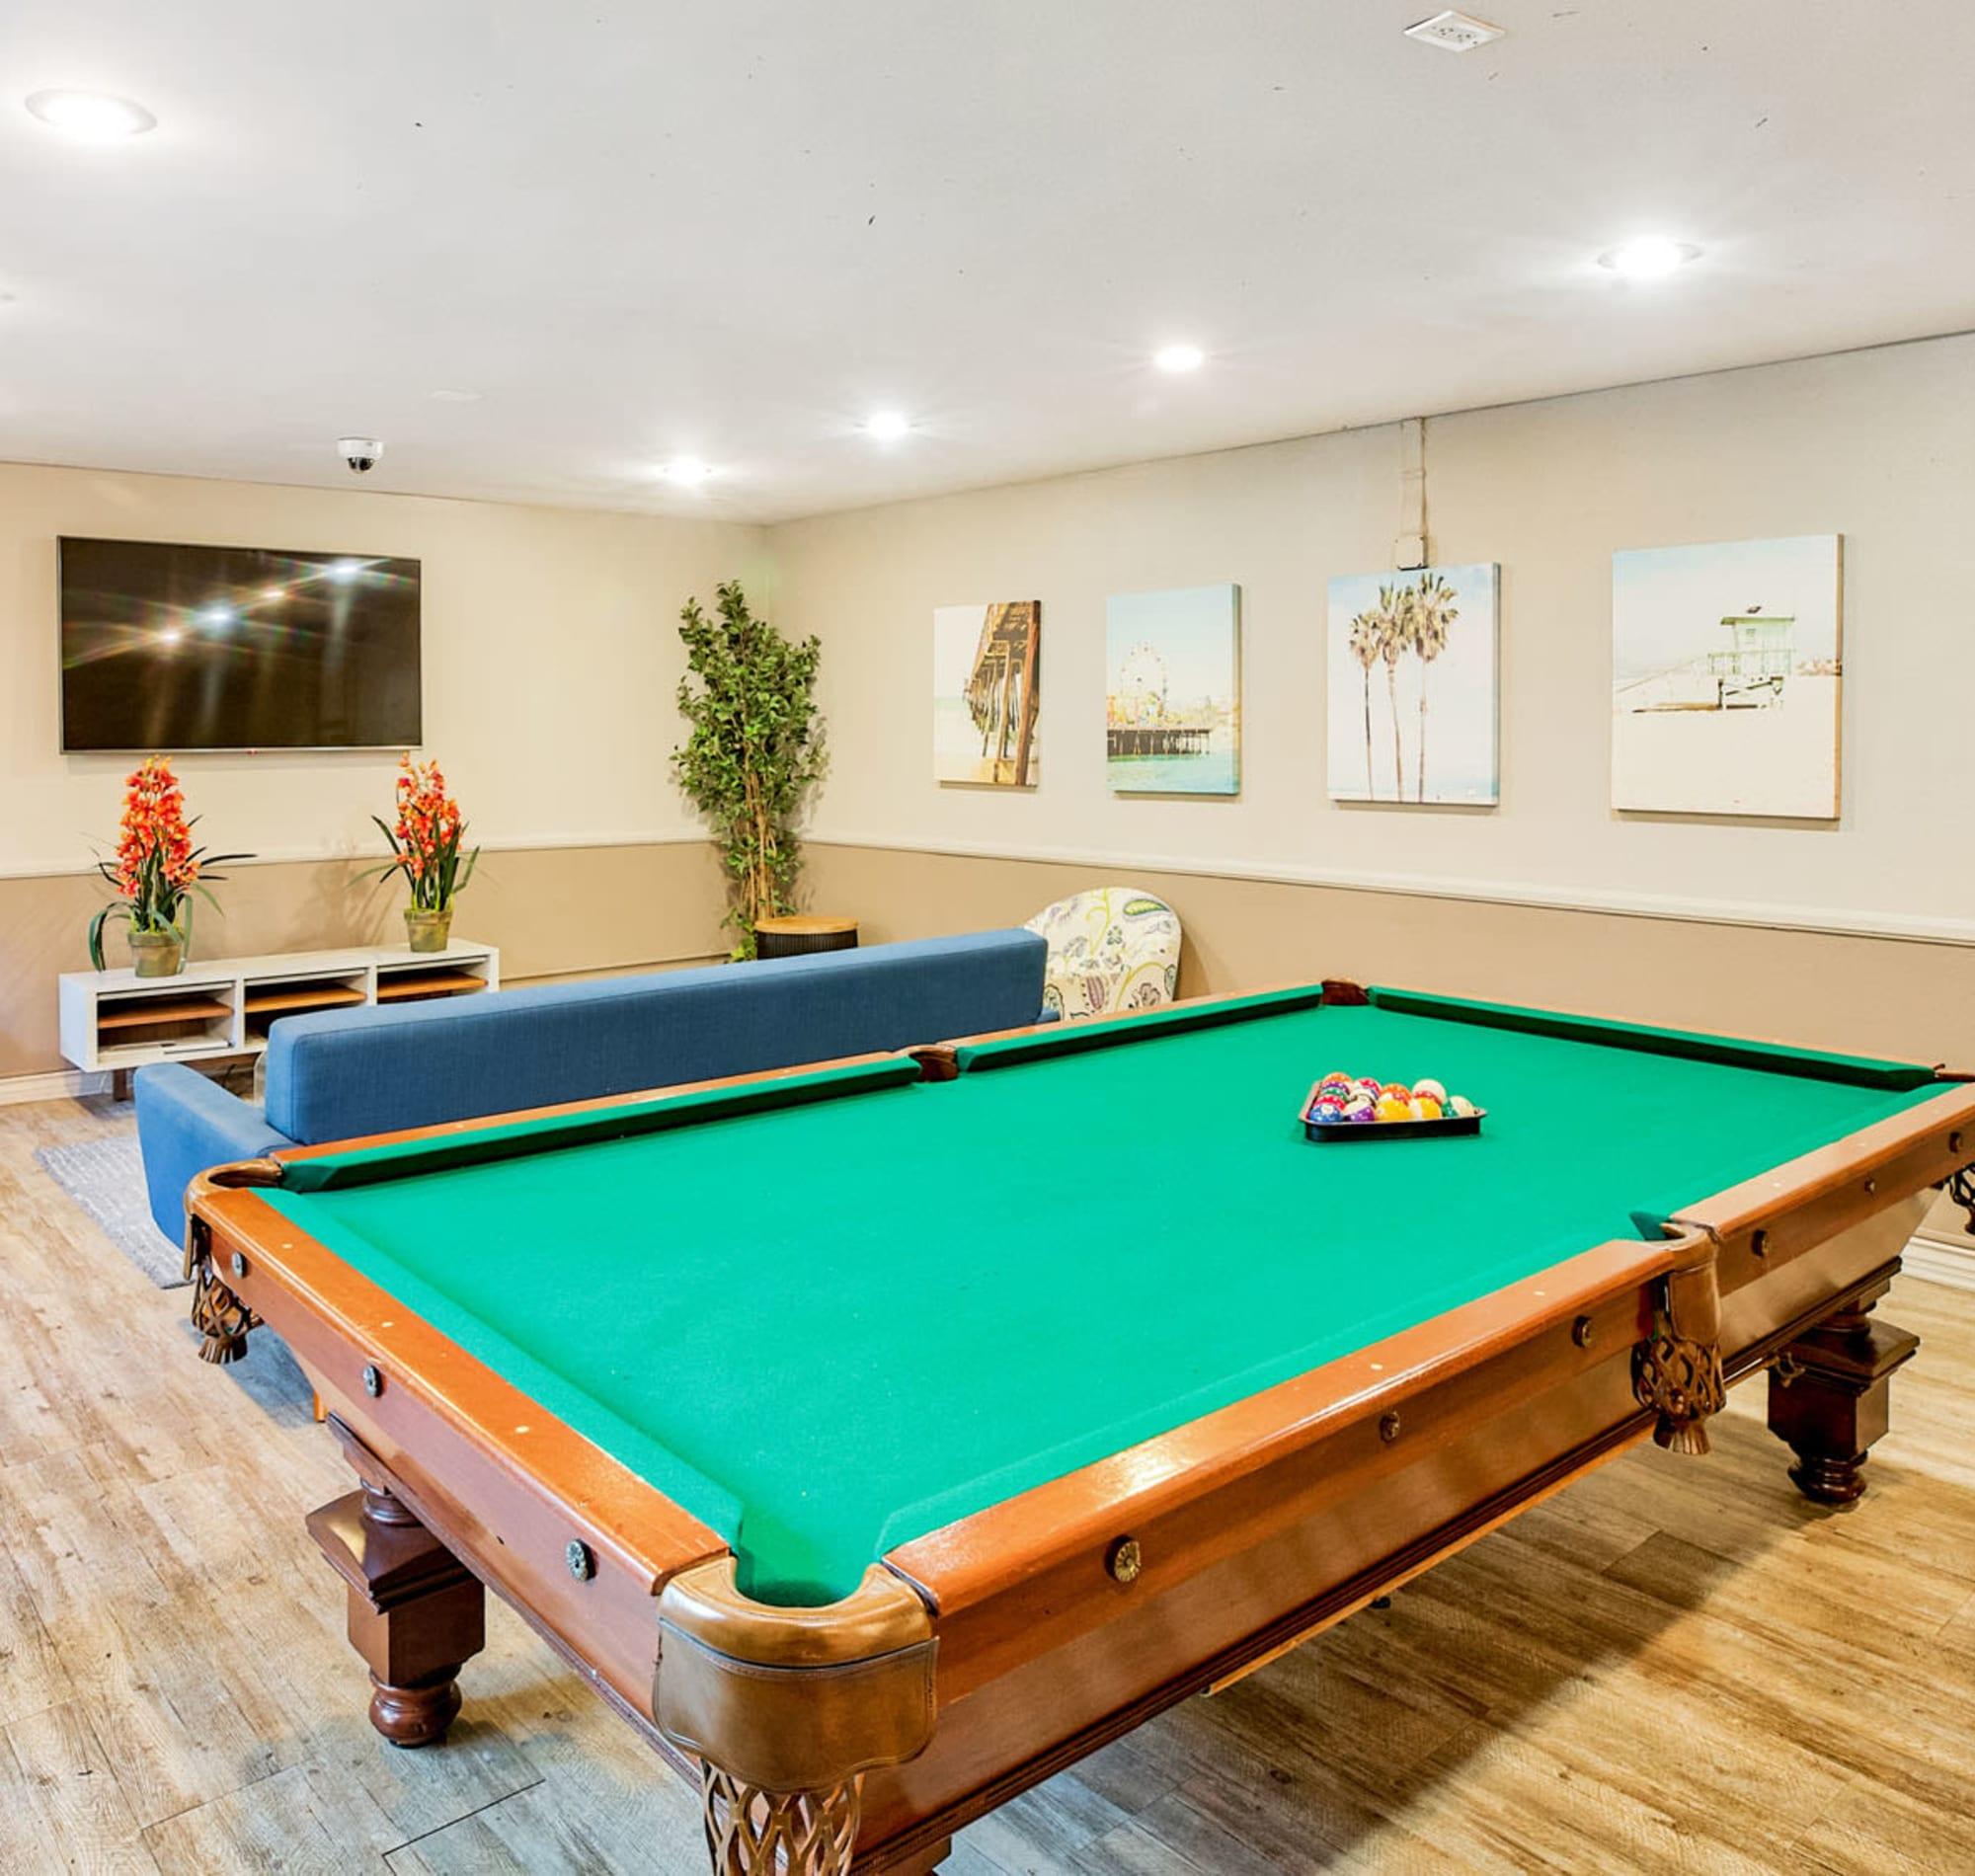 Billiards table in the Fiesta Room at Casa Granada in Los Angeles, California